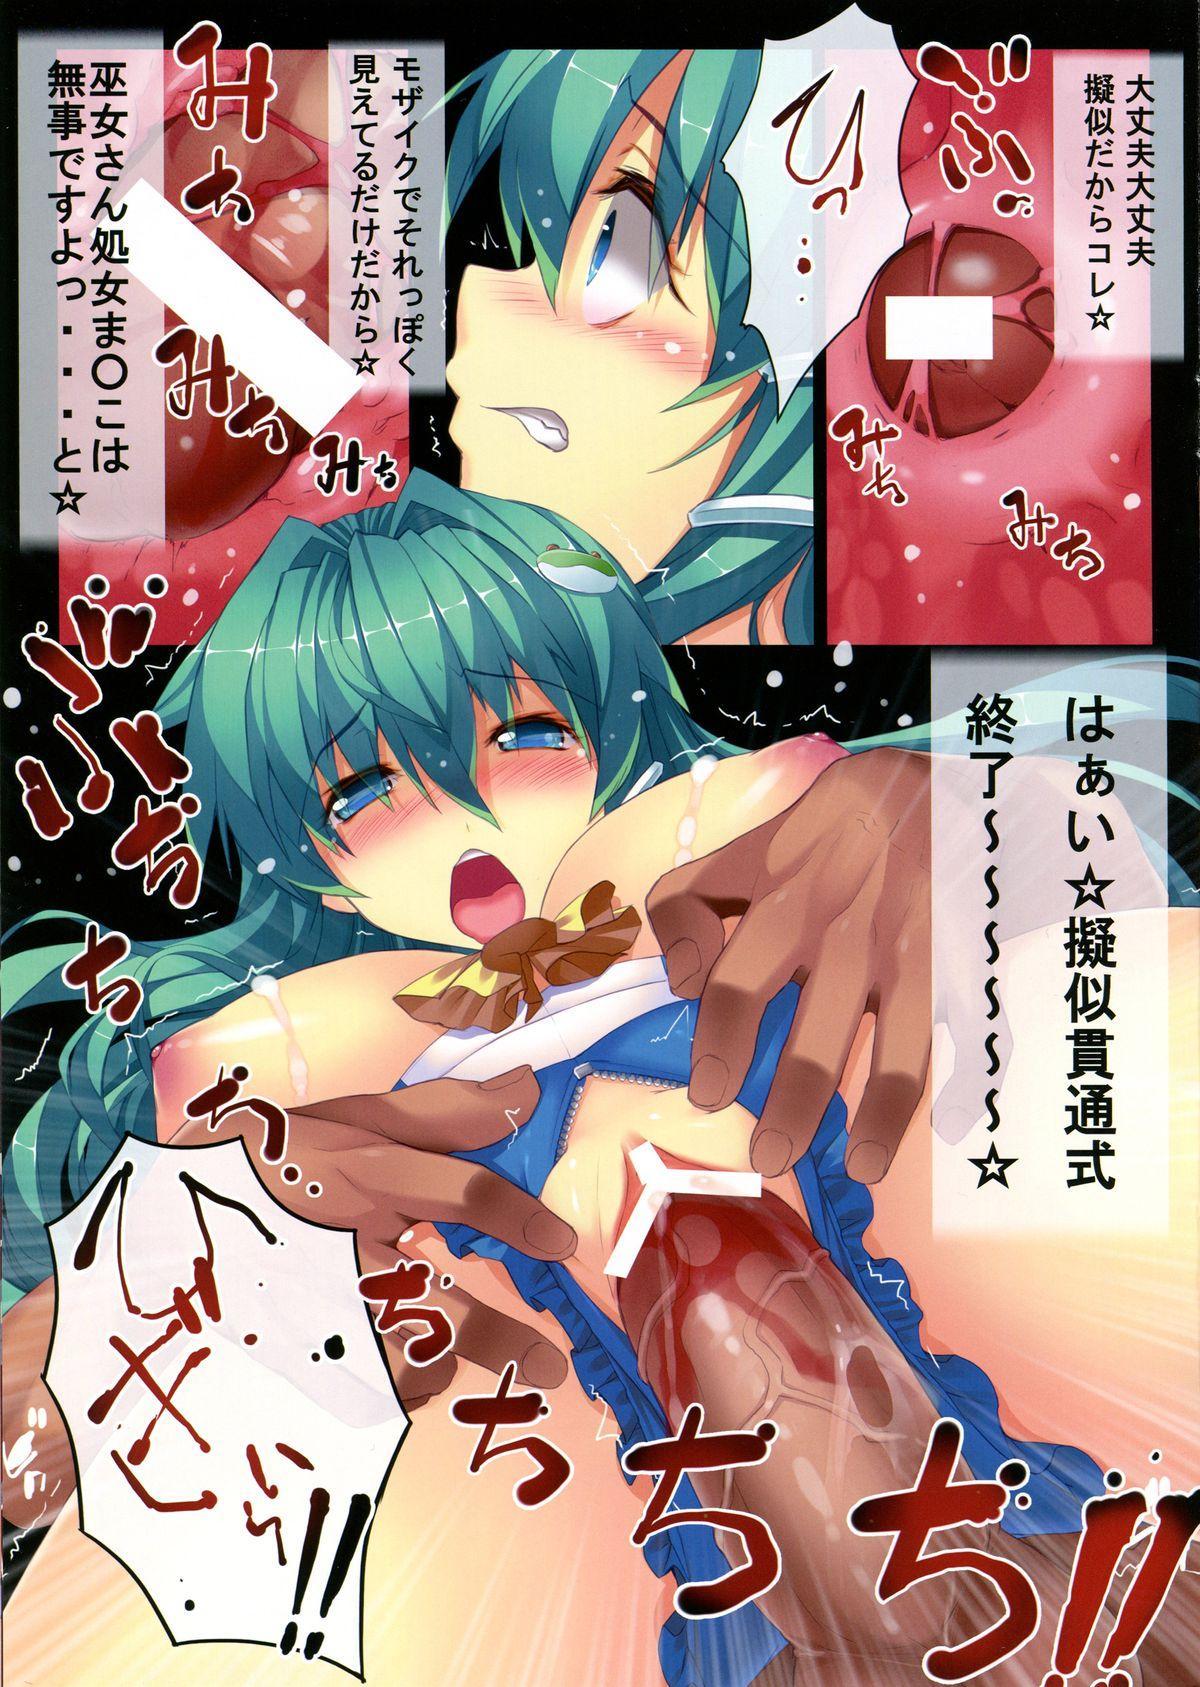 (Reitaisai 10) [Studio Himawari (Himukai Kyousuke)] Touhou Idol Musume Nama Nakadashi 1 Sanae-chan 1x-sai (Tohou Project) 11